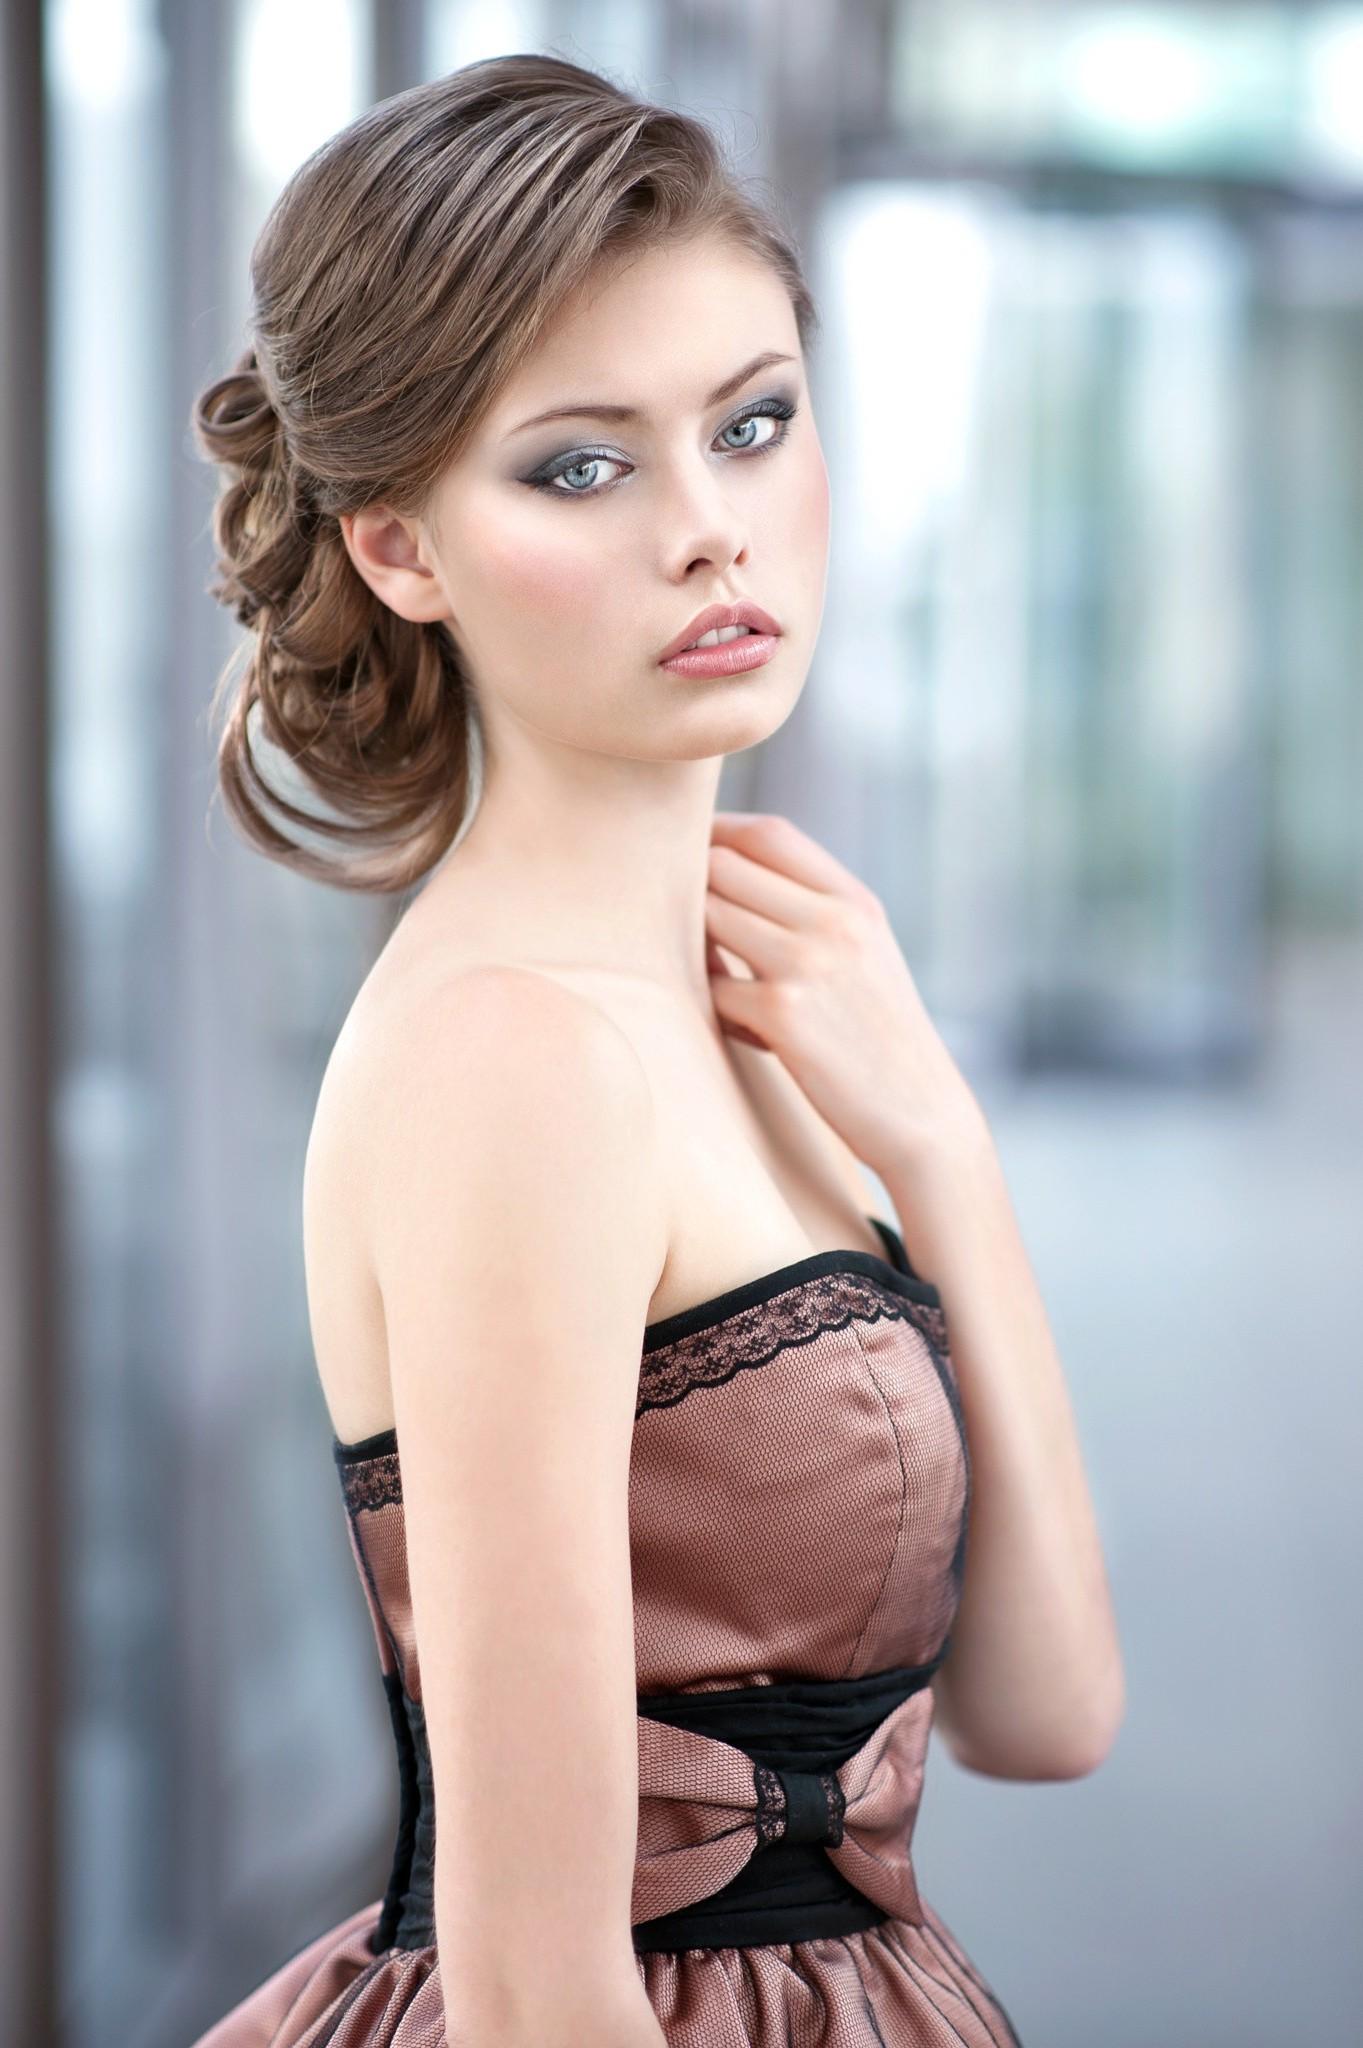 Hintergrundbilder : Frau, Modell-, lange Haare, Fotografie, Kleid